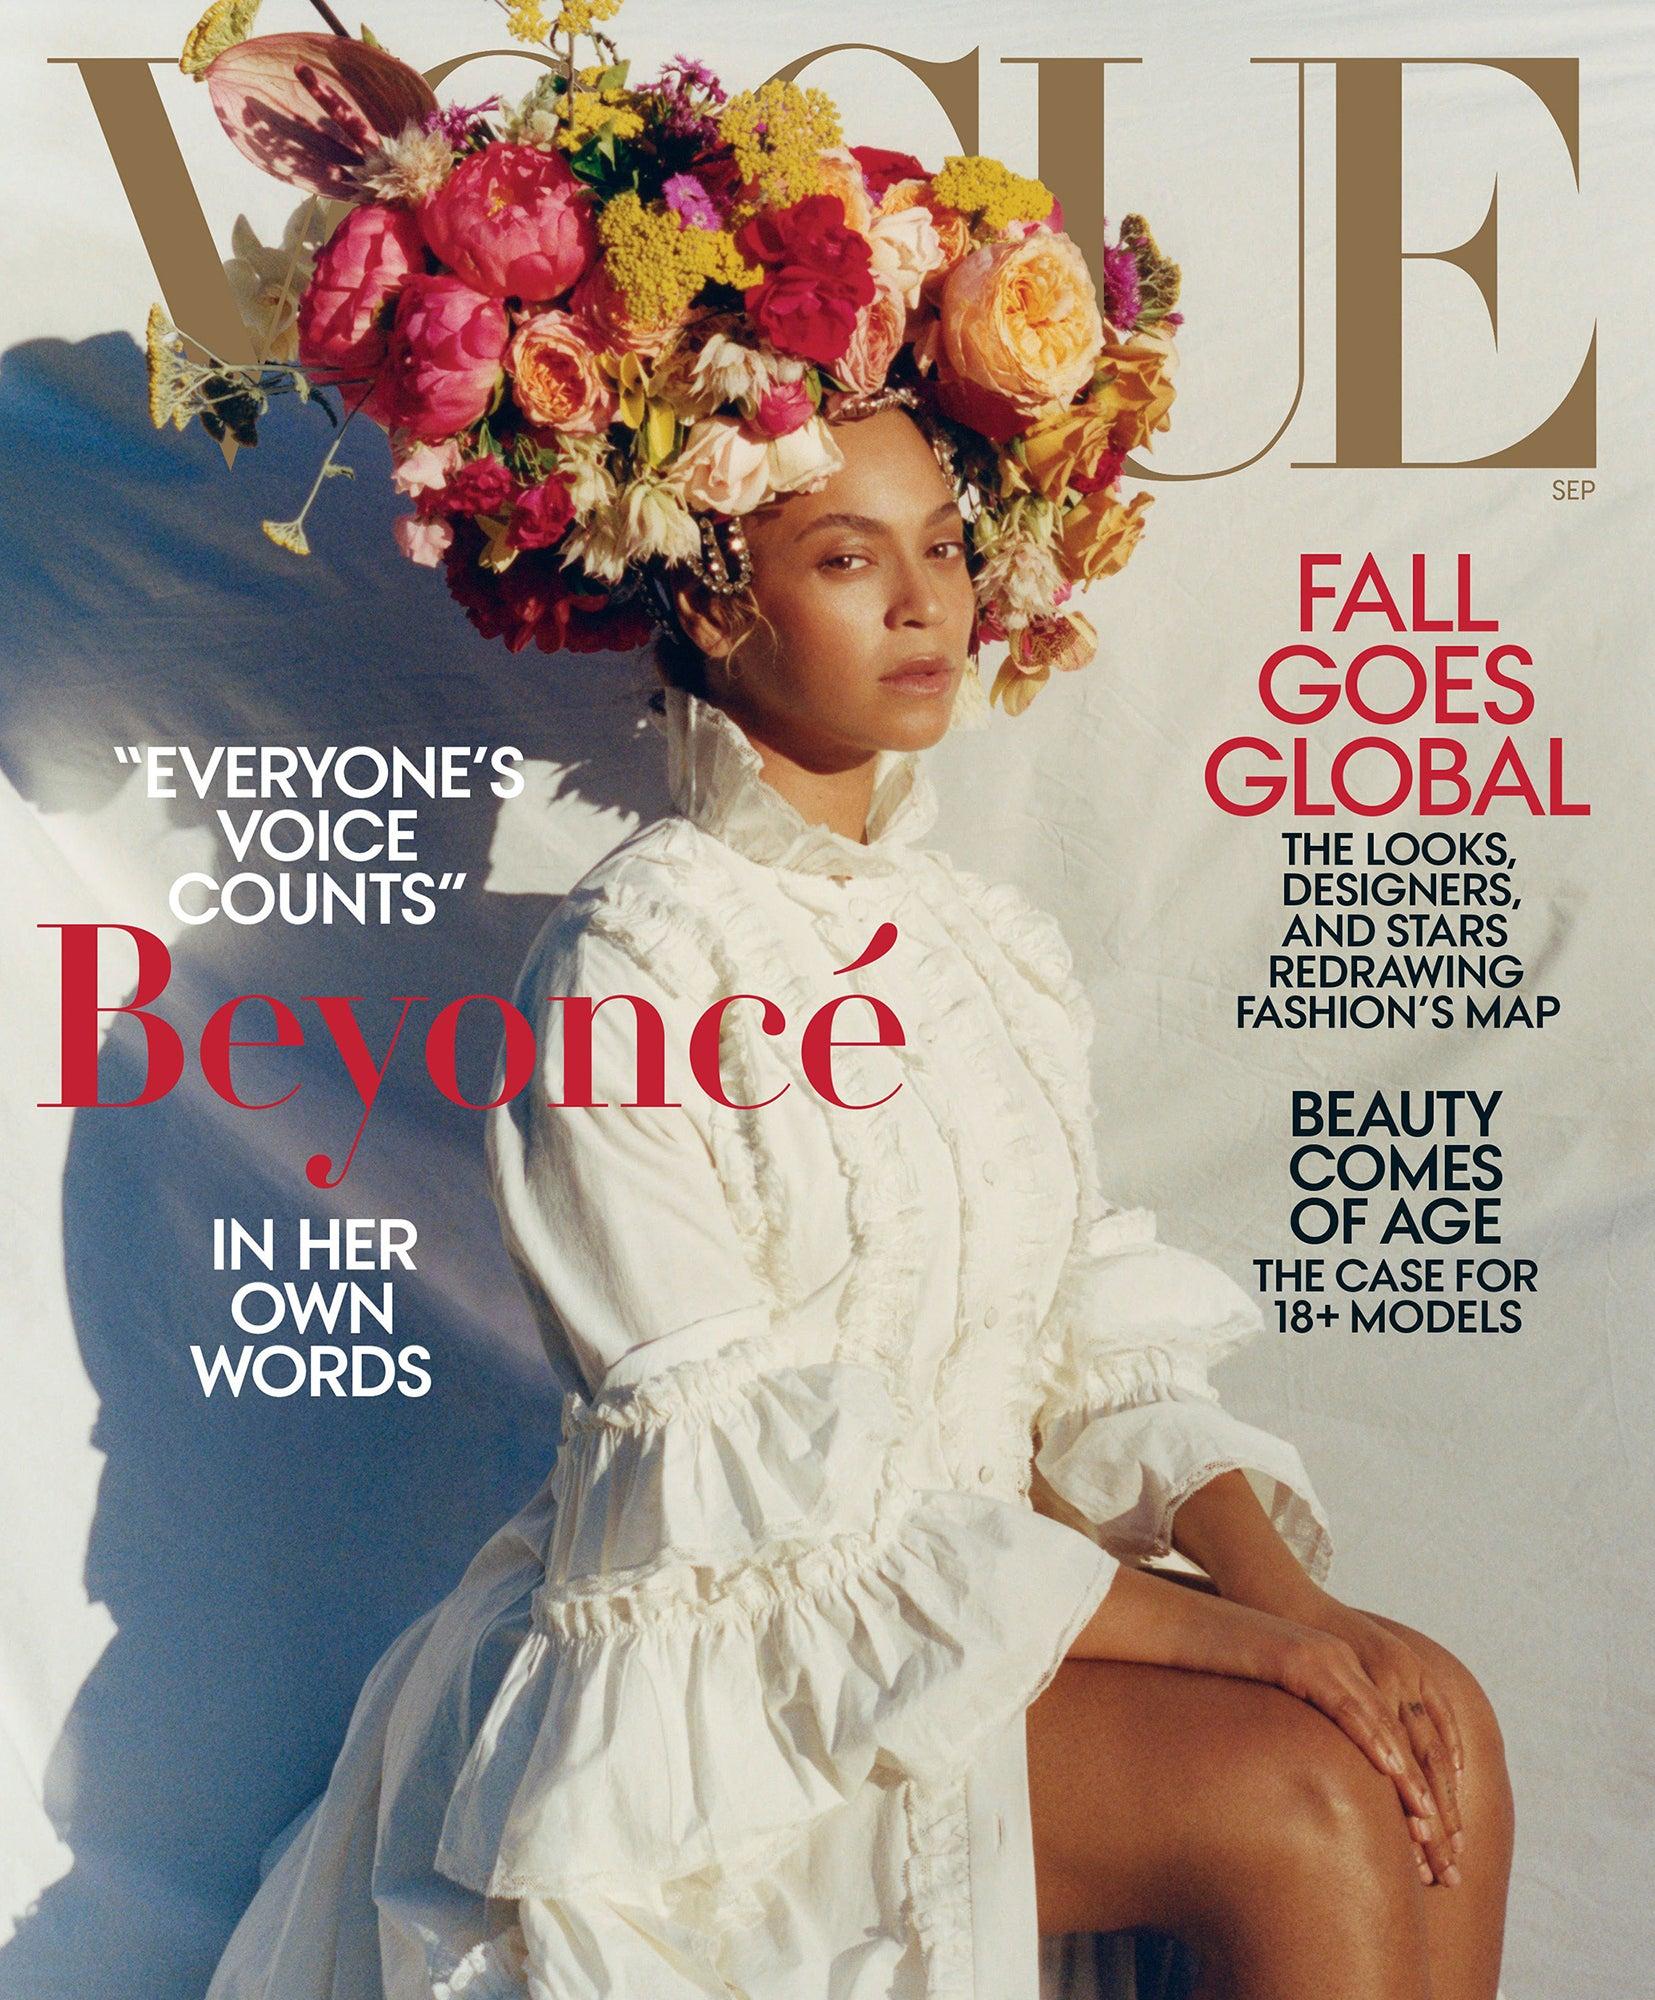 vogue_Beyonce_cover_image_courtesy_of_VogueMagazine